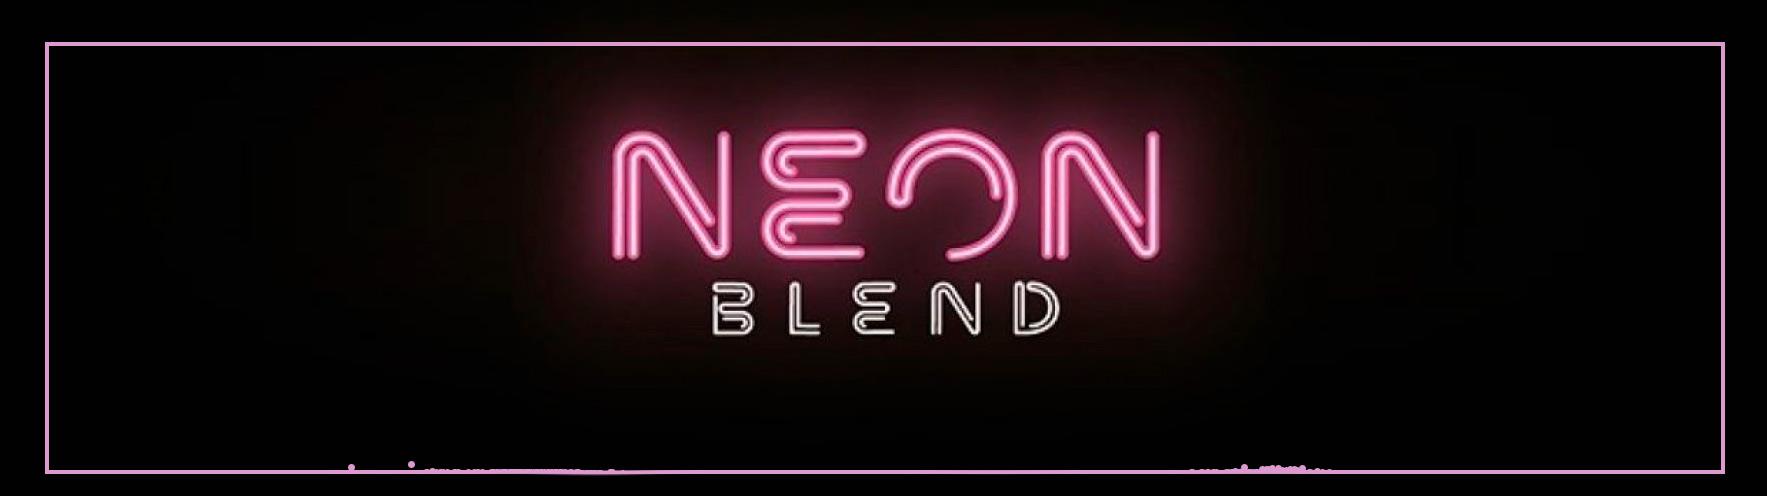 bestabachnaja smes dlja kaljana neon blend - Бестабачная смесь для кальяна Neon Blend